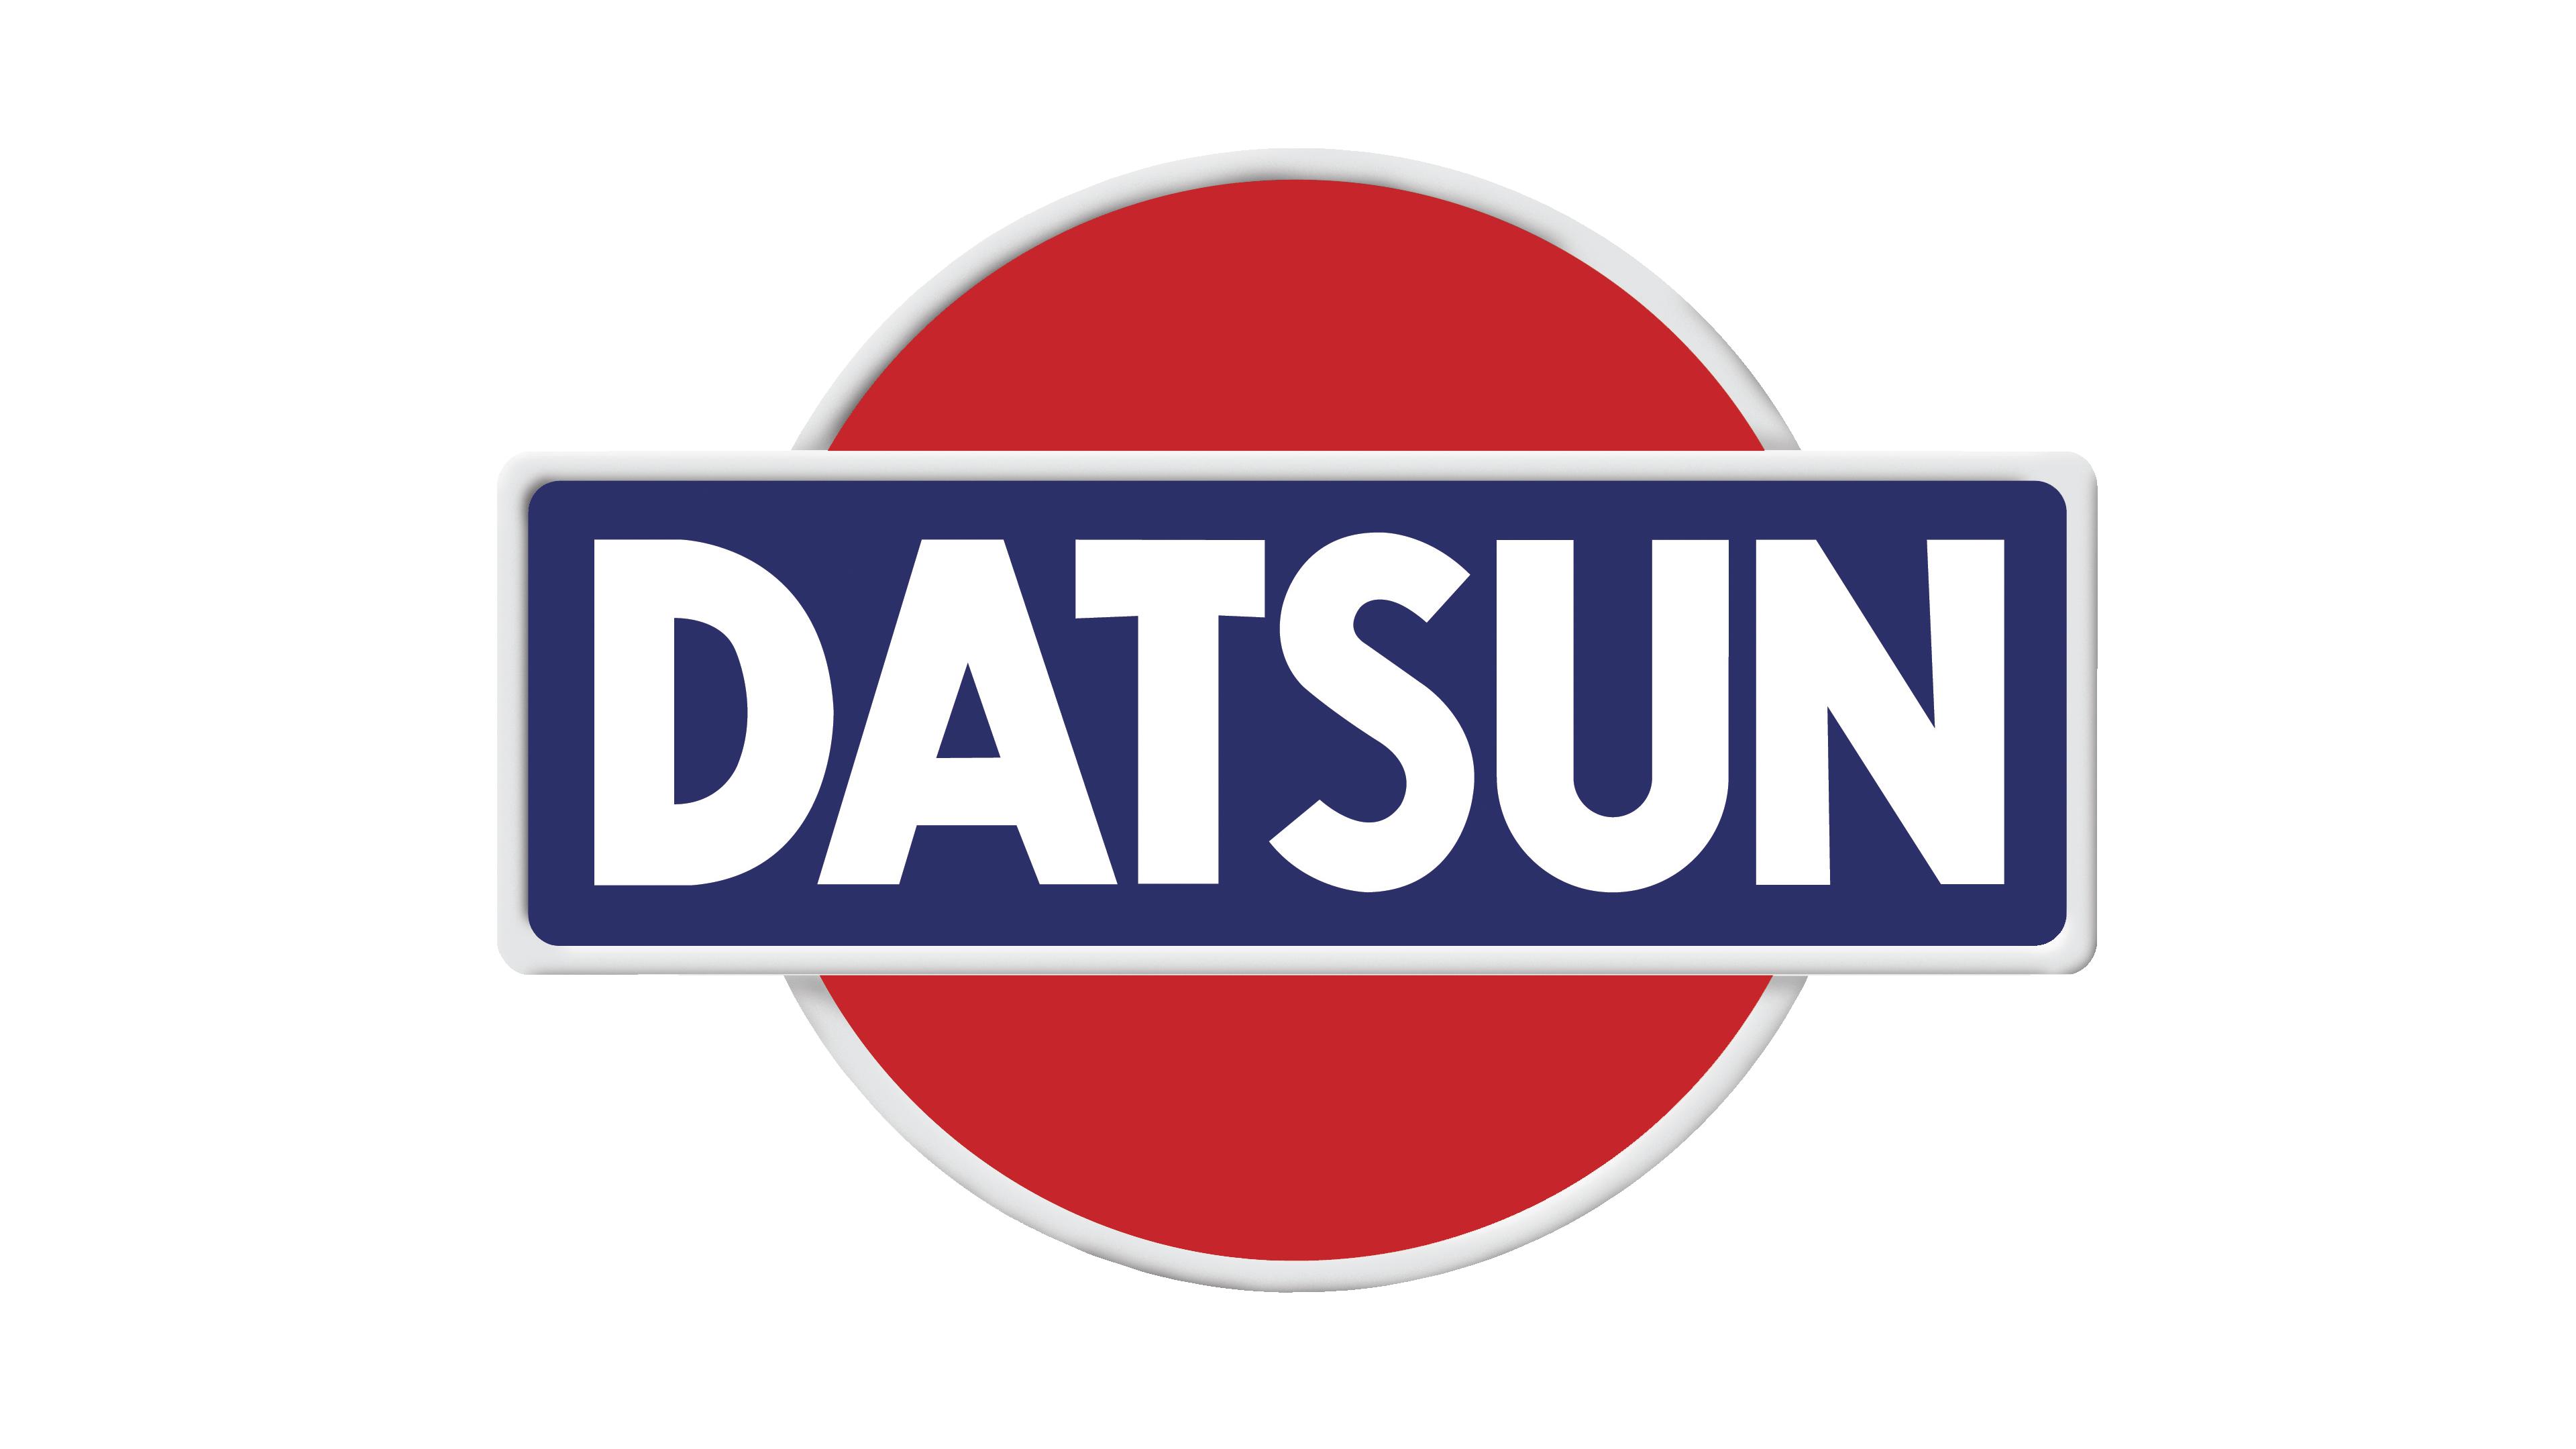 Datsun Logo, HD Png, Meaning, Information ダットサン, ベレット, 車 ロゴ